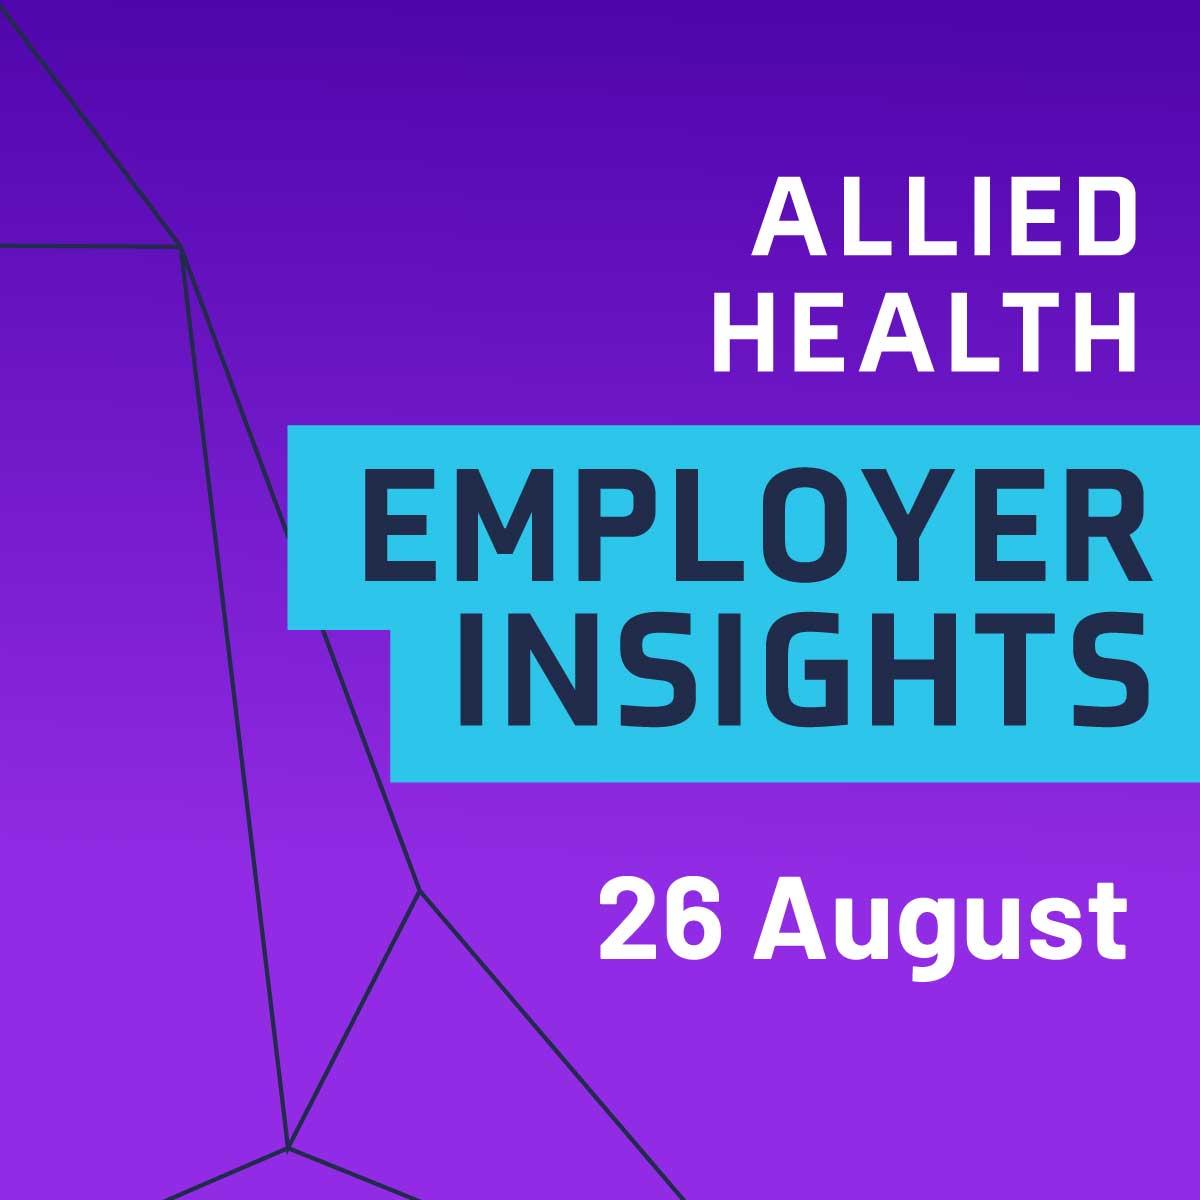 Allied Health Employer Insights